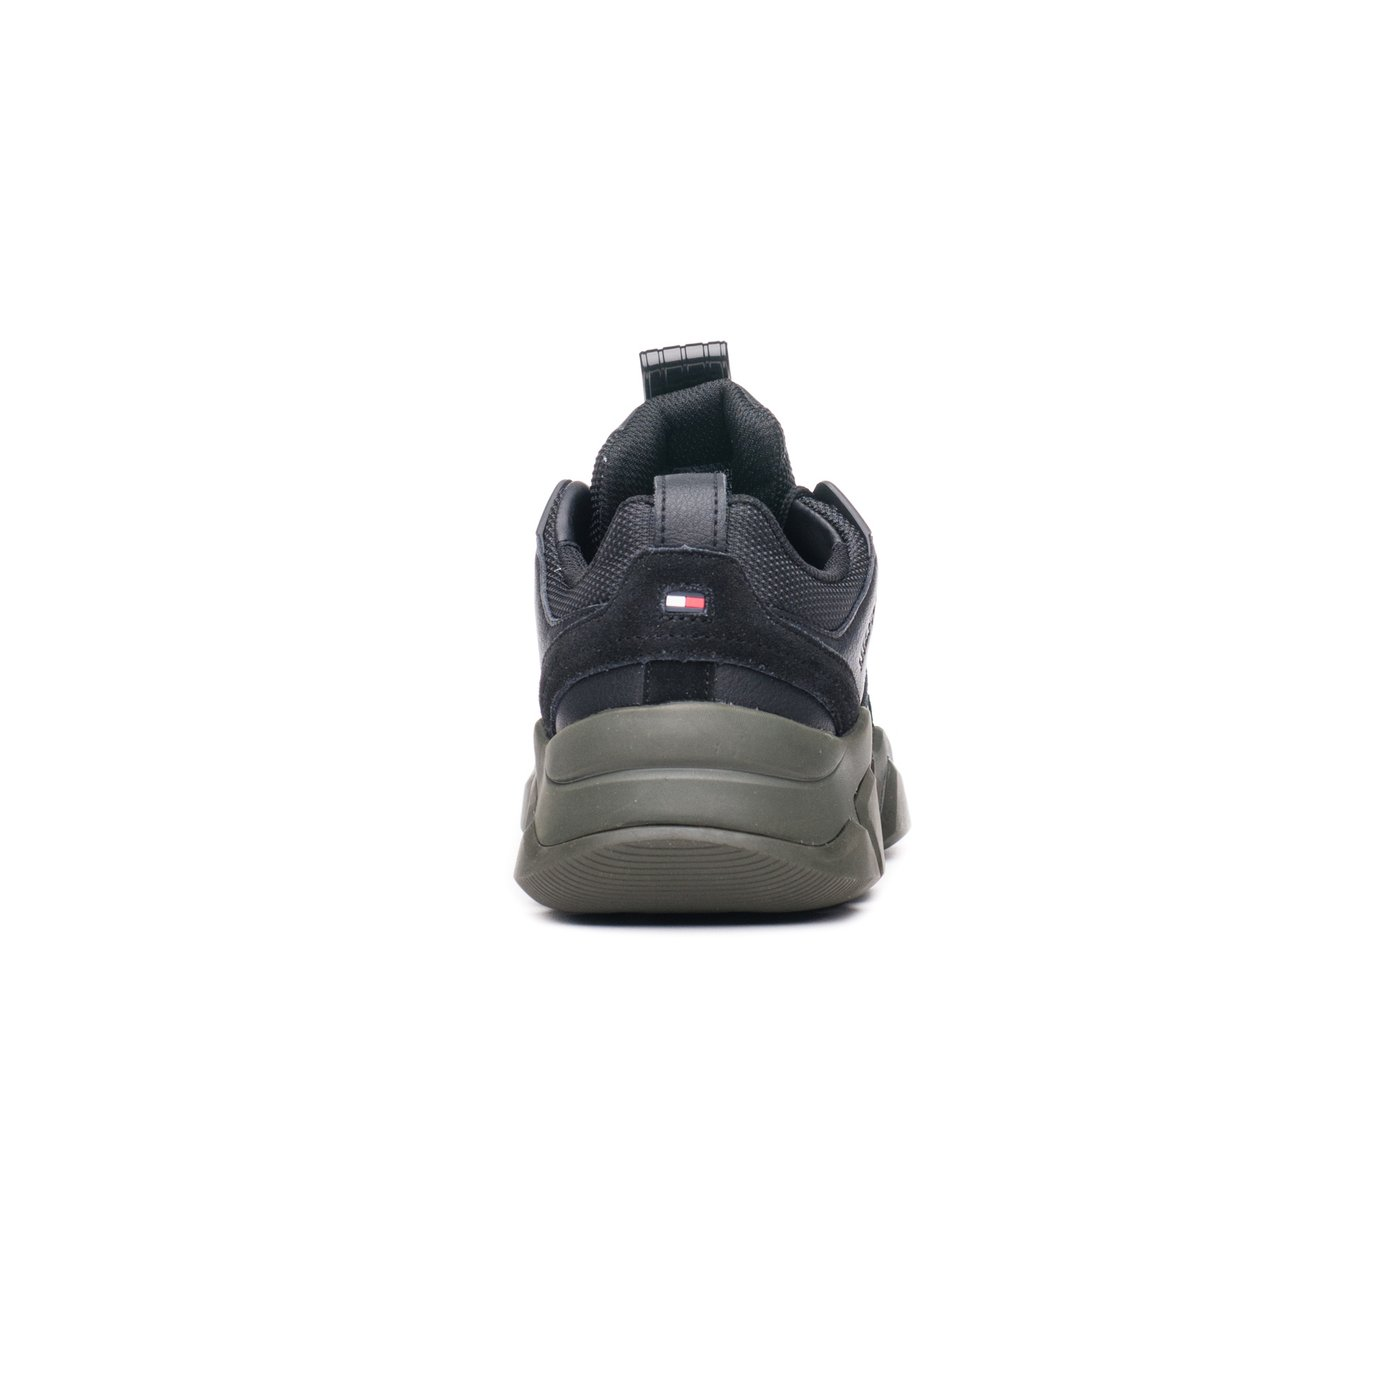 Кросівки чоловічі Tommy Hilfiger CHUNKY MATERIAL MIX SNEAKER